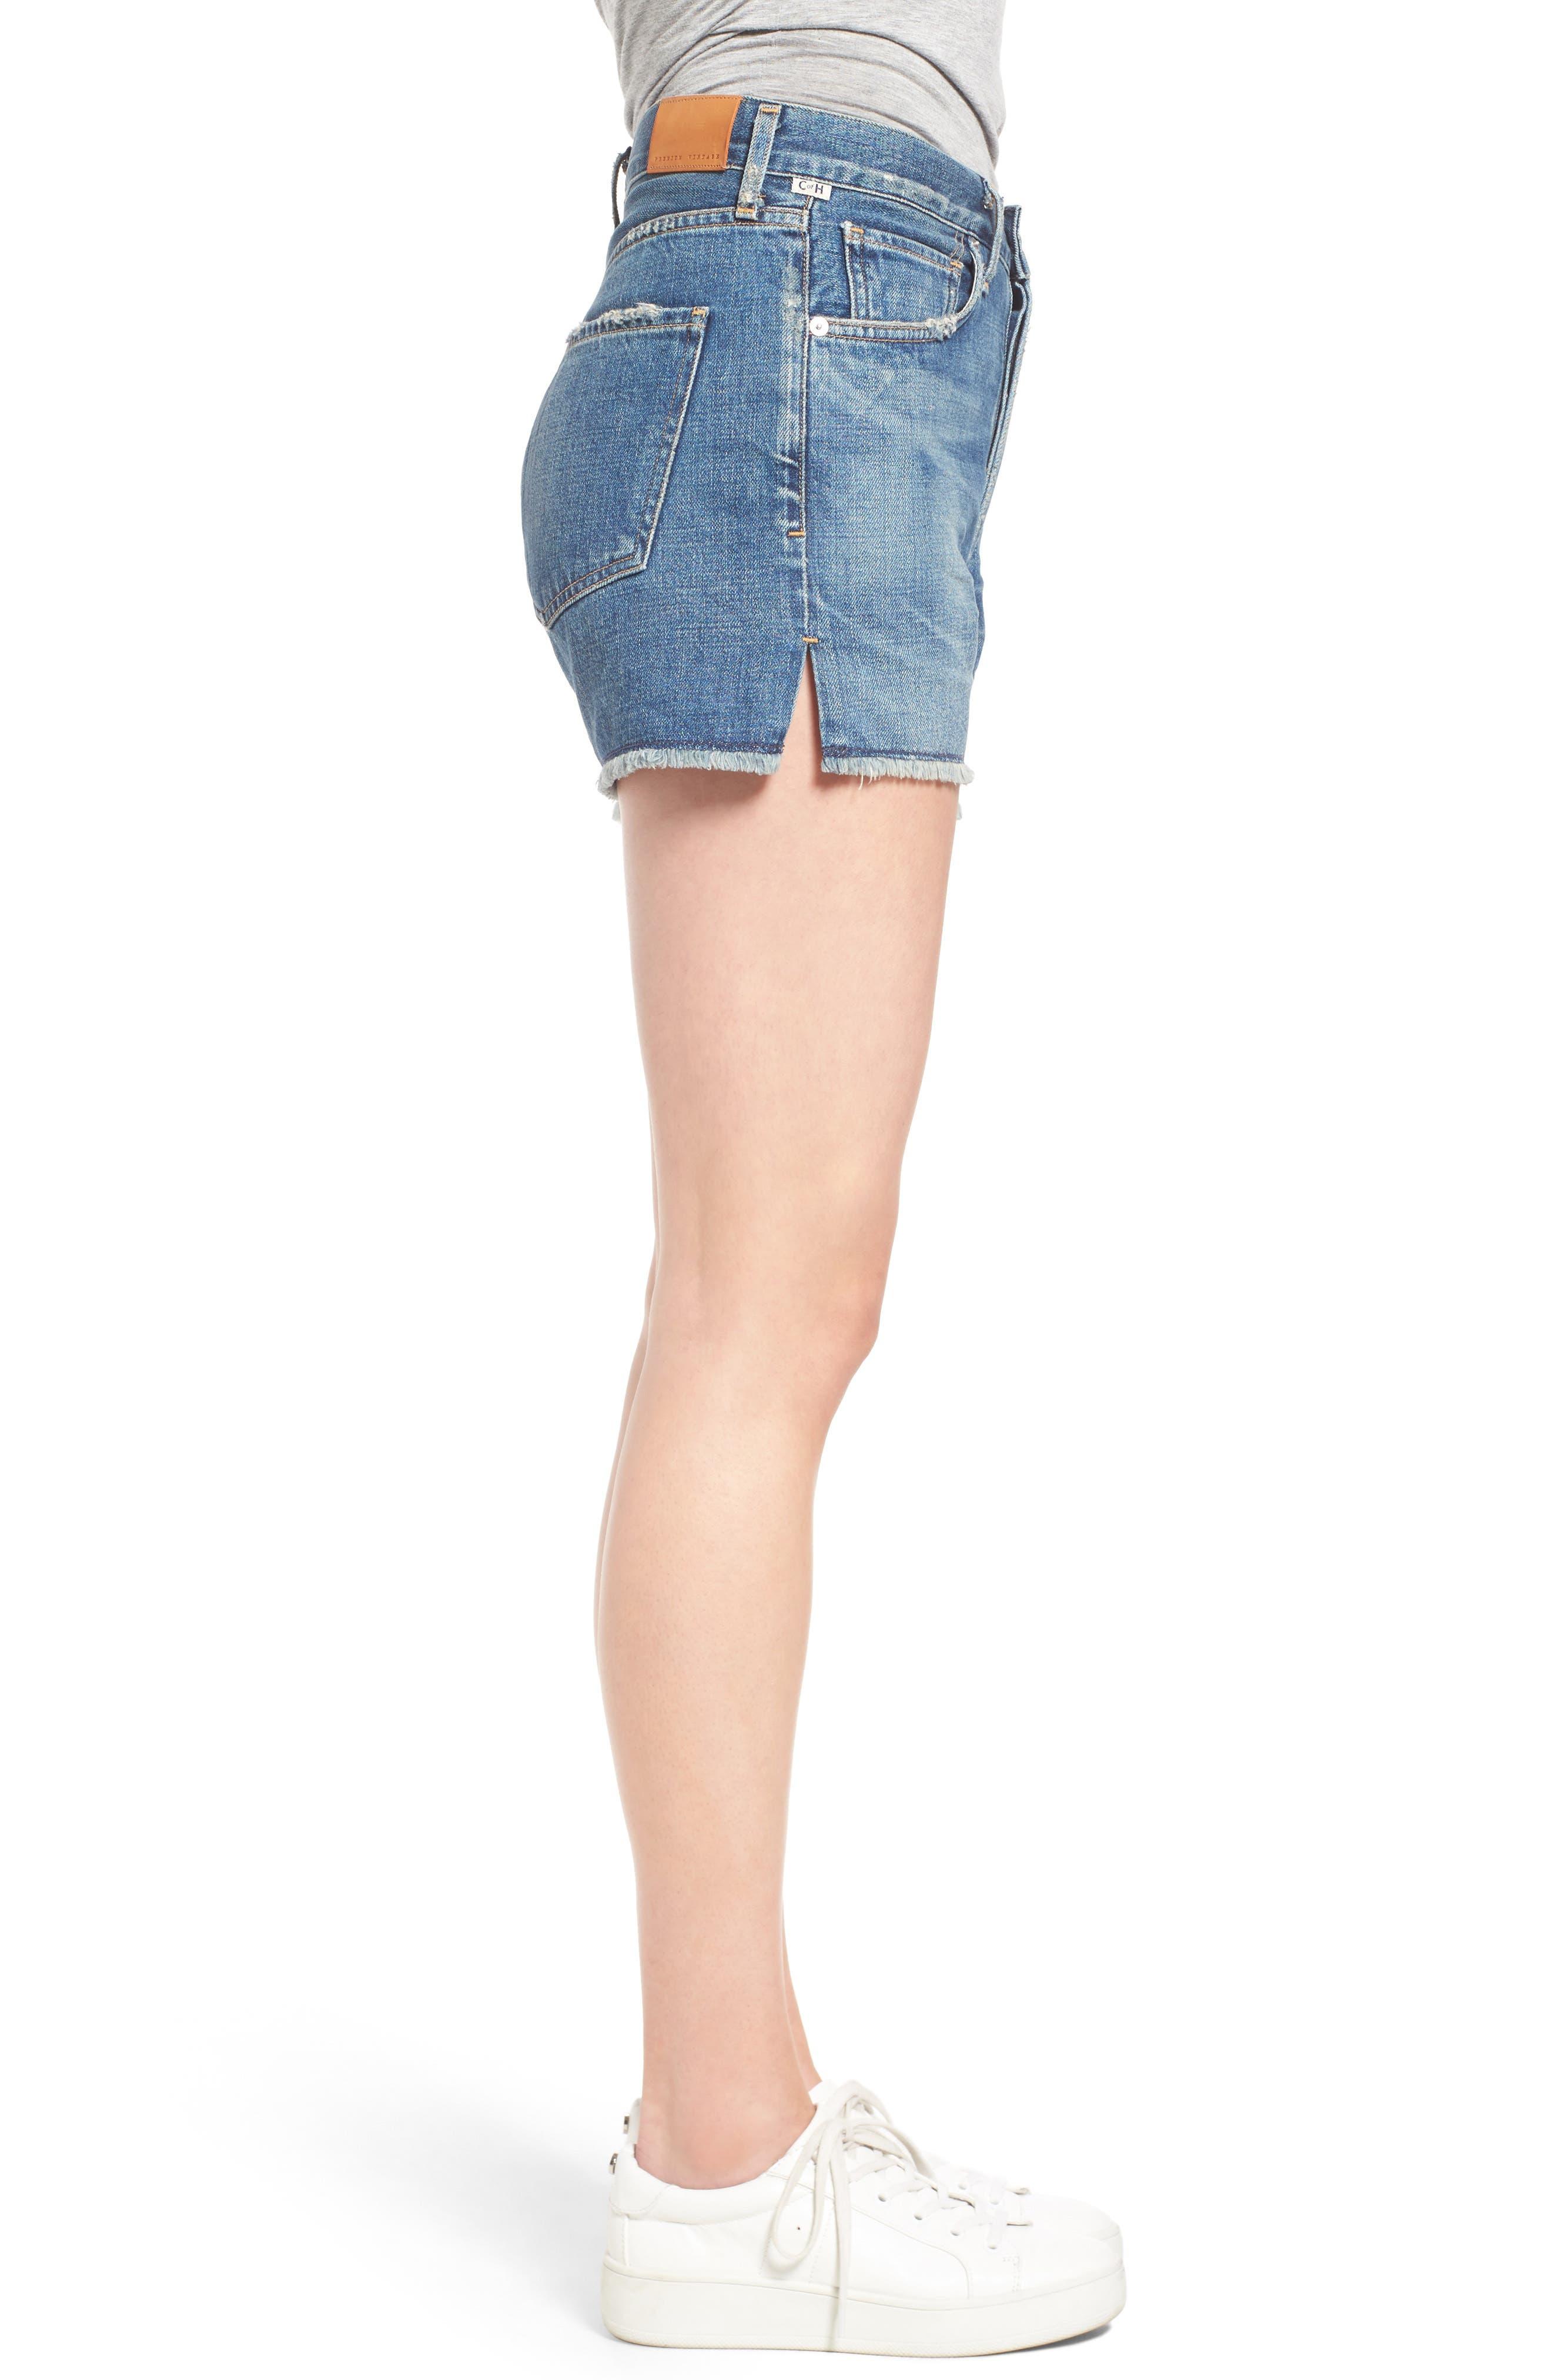 Alyx High Waist Cutoff Denim Shorts,                             Alternate thumbnail 3, color,                             Teaser